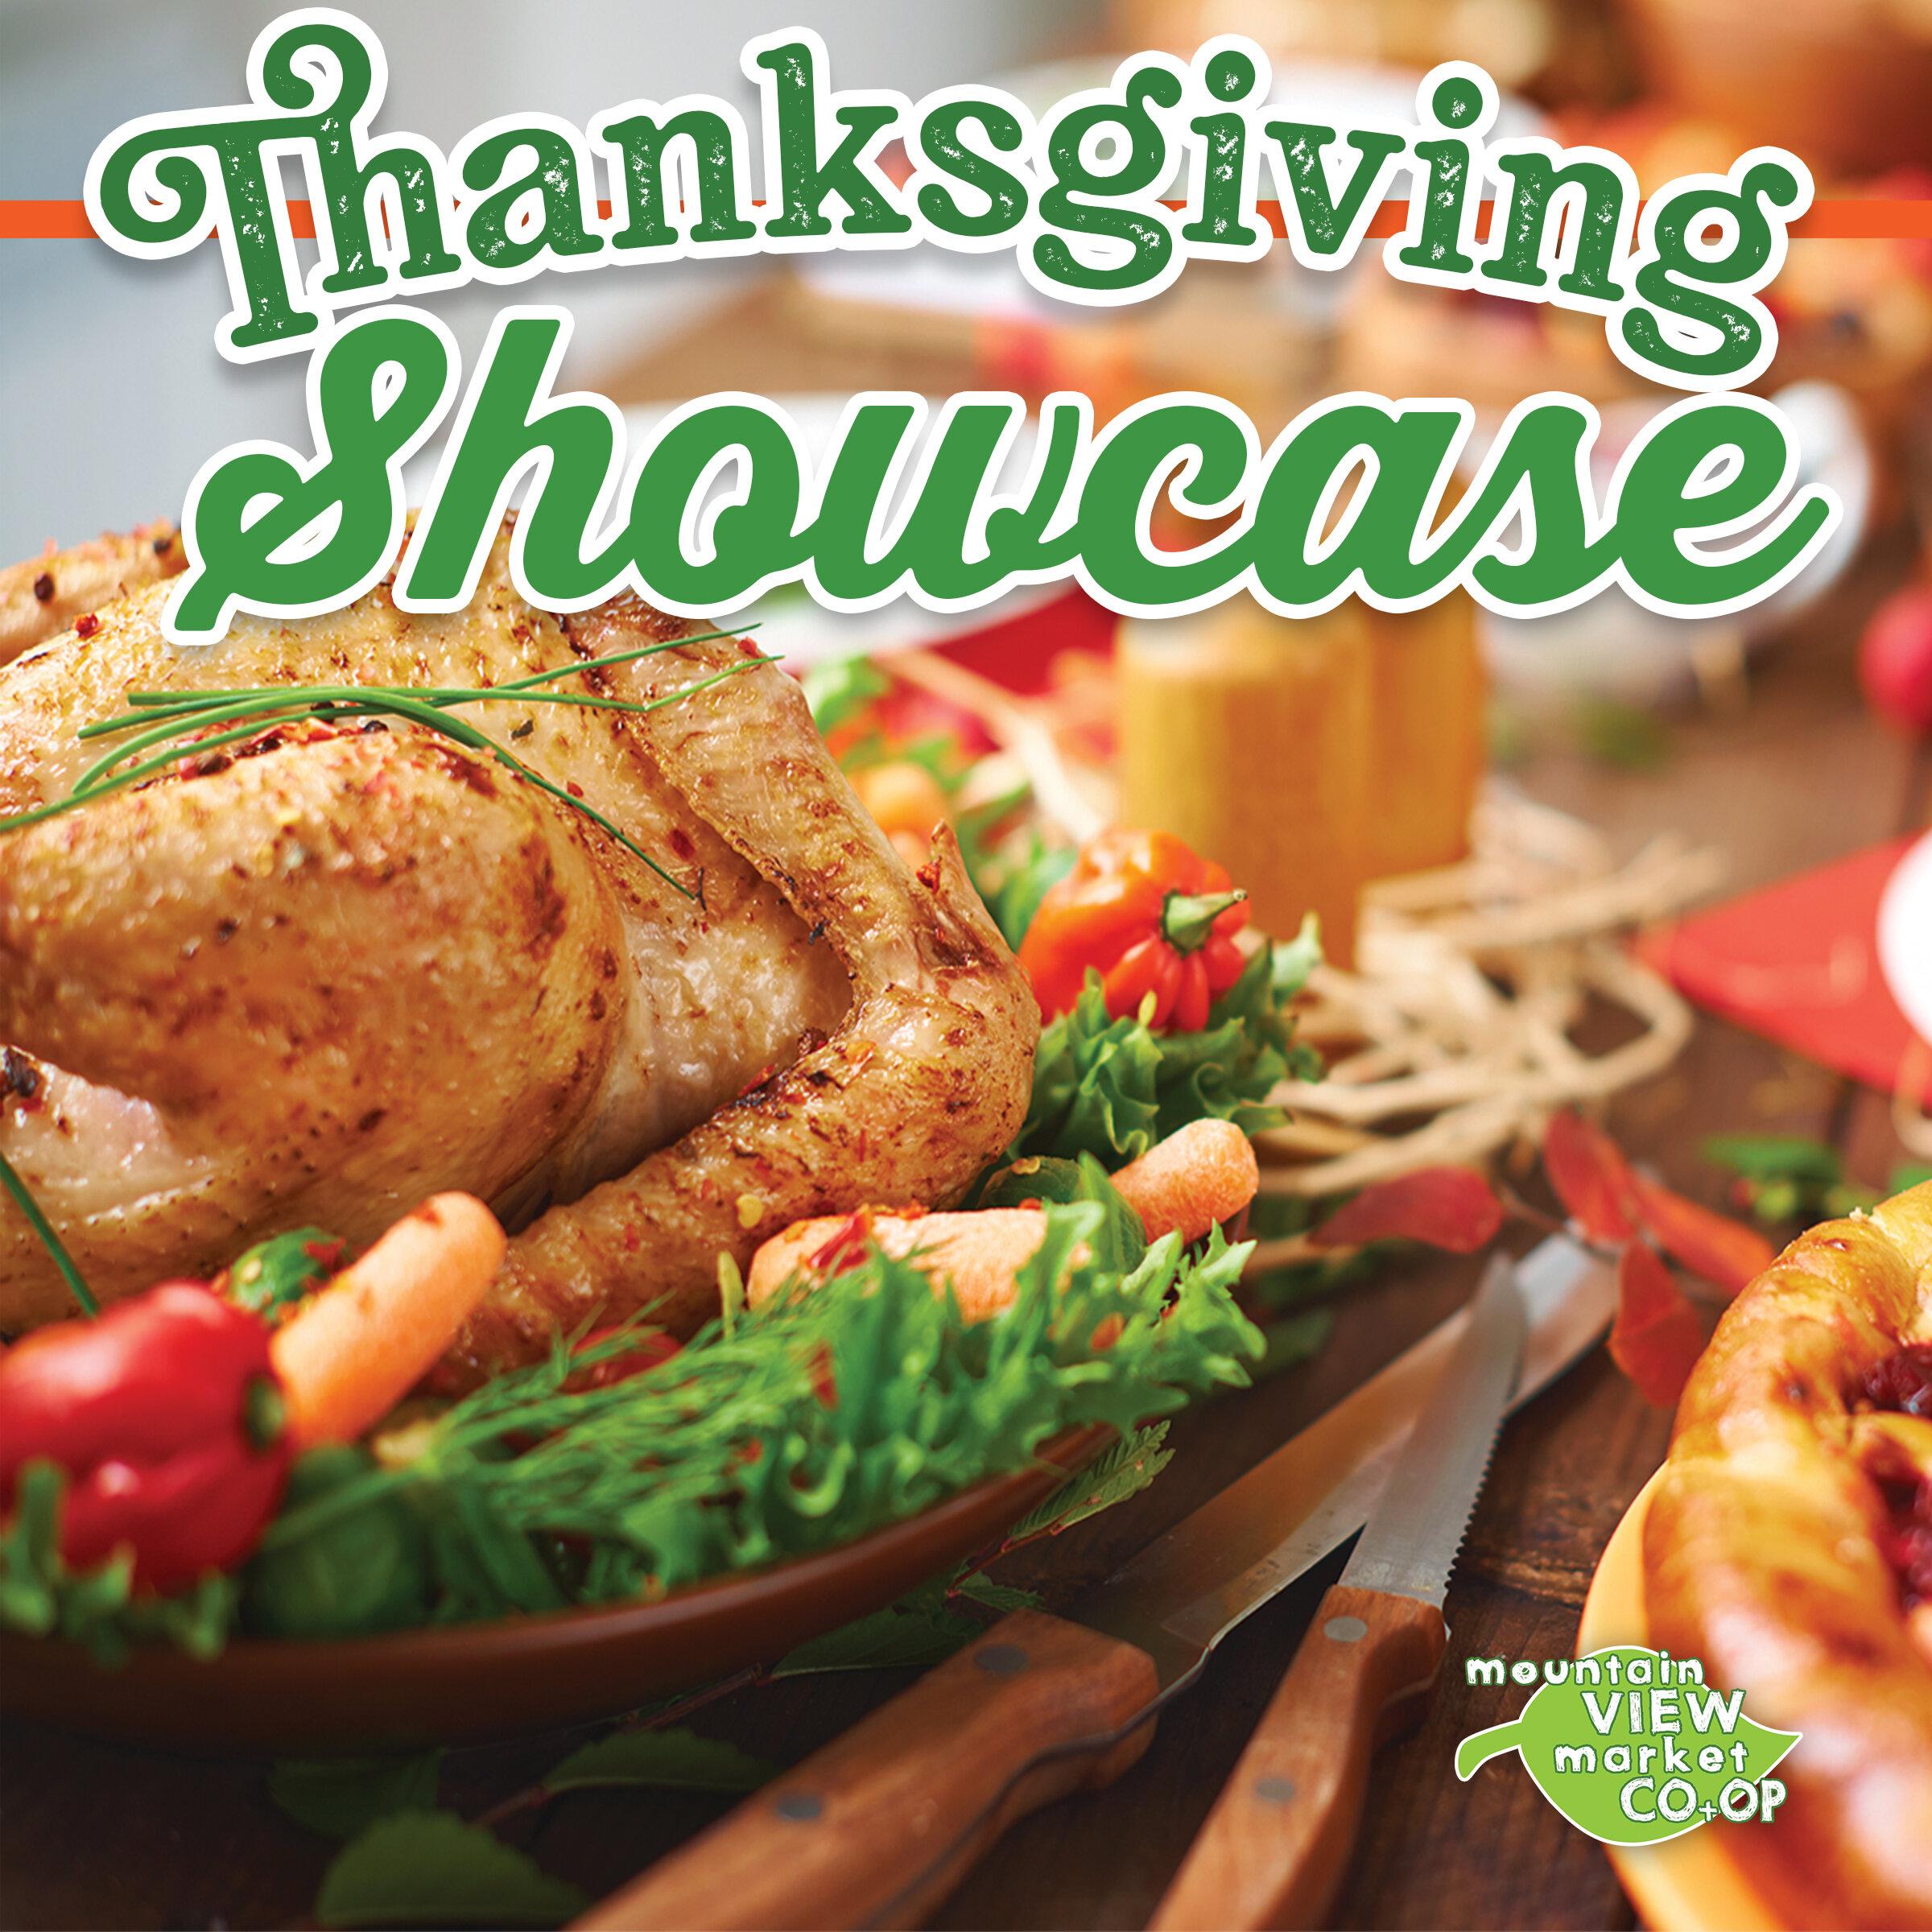 Thanksgiving Showcase event and social media.jpg